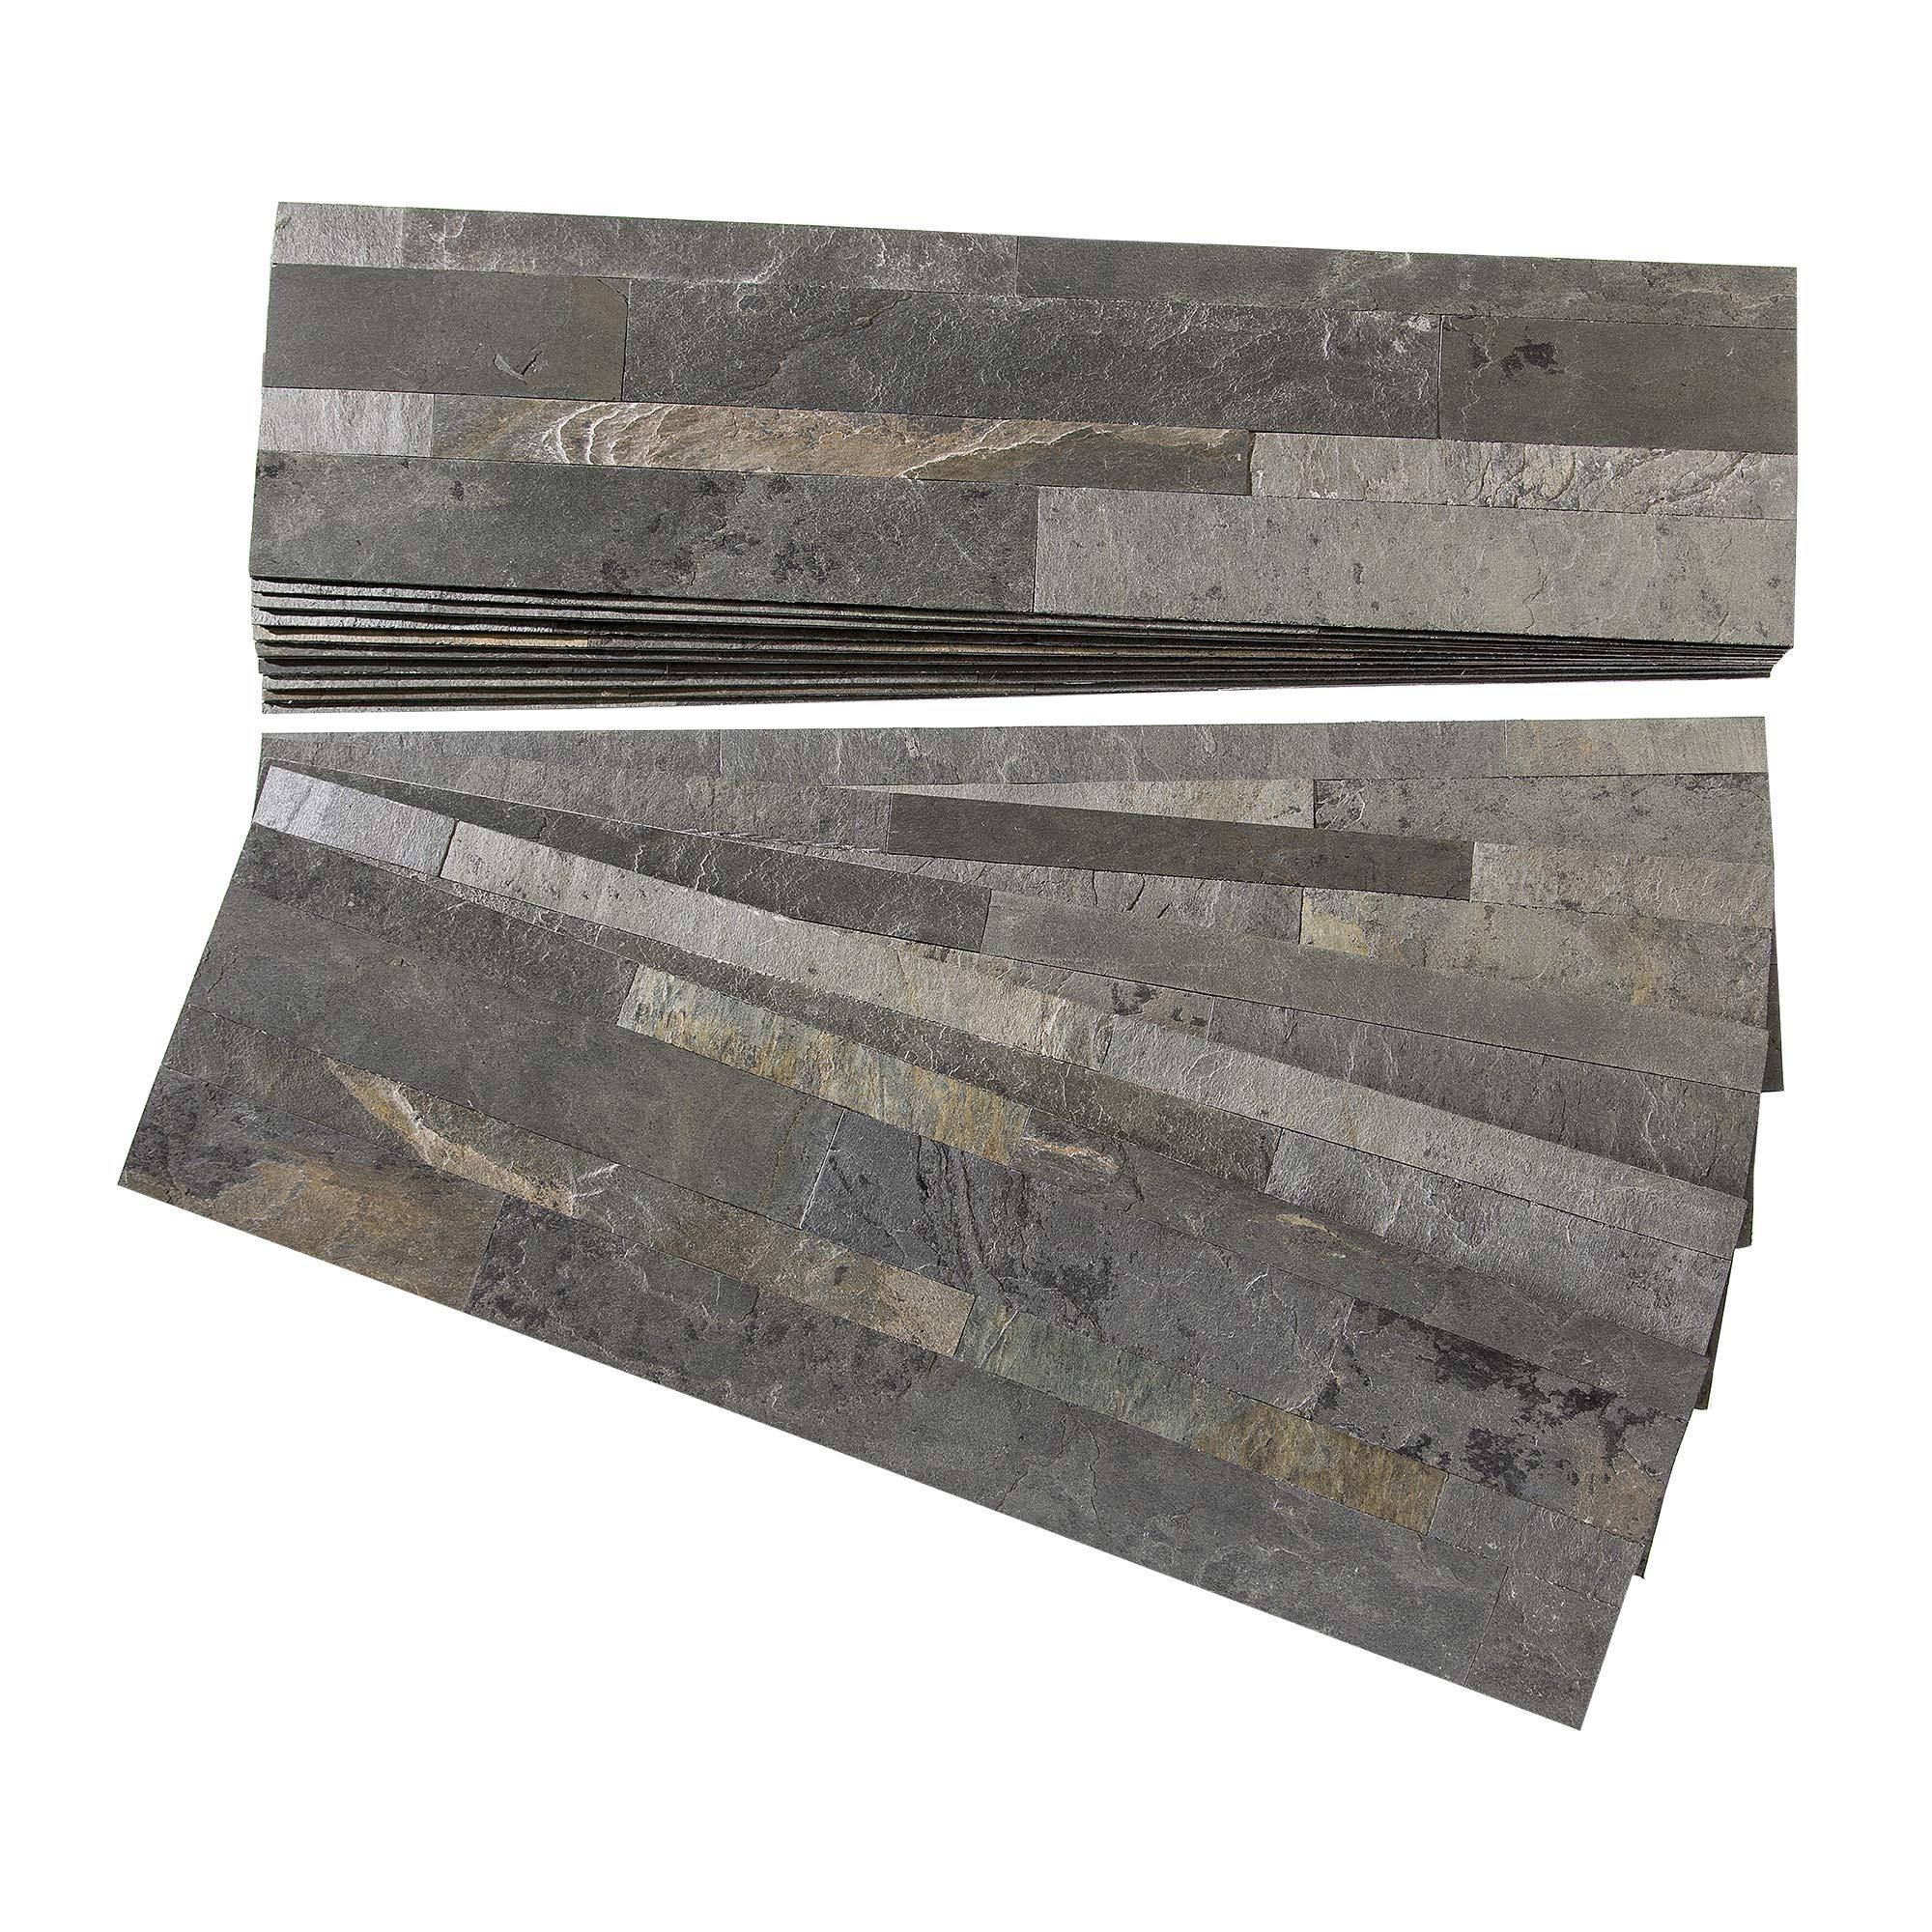 Aspect Peel and Stick Stone Overlay Kitchen Backsplash - Iron Slate (Approx. 15 sq ft Kit) - Easy DIY Tile Backsplash